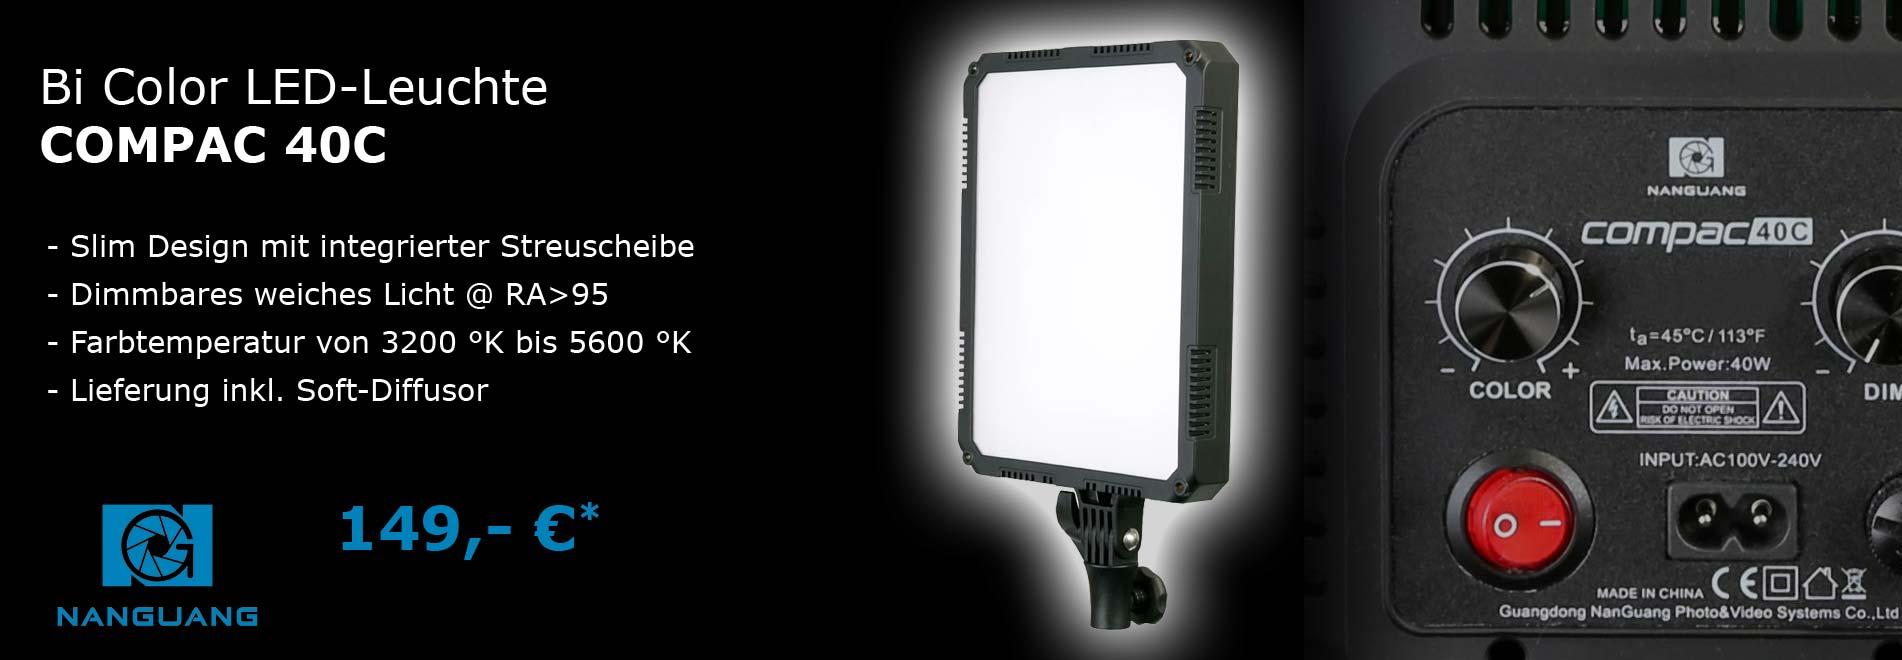 LED-Studioleuchte compac